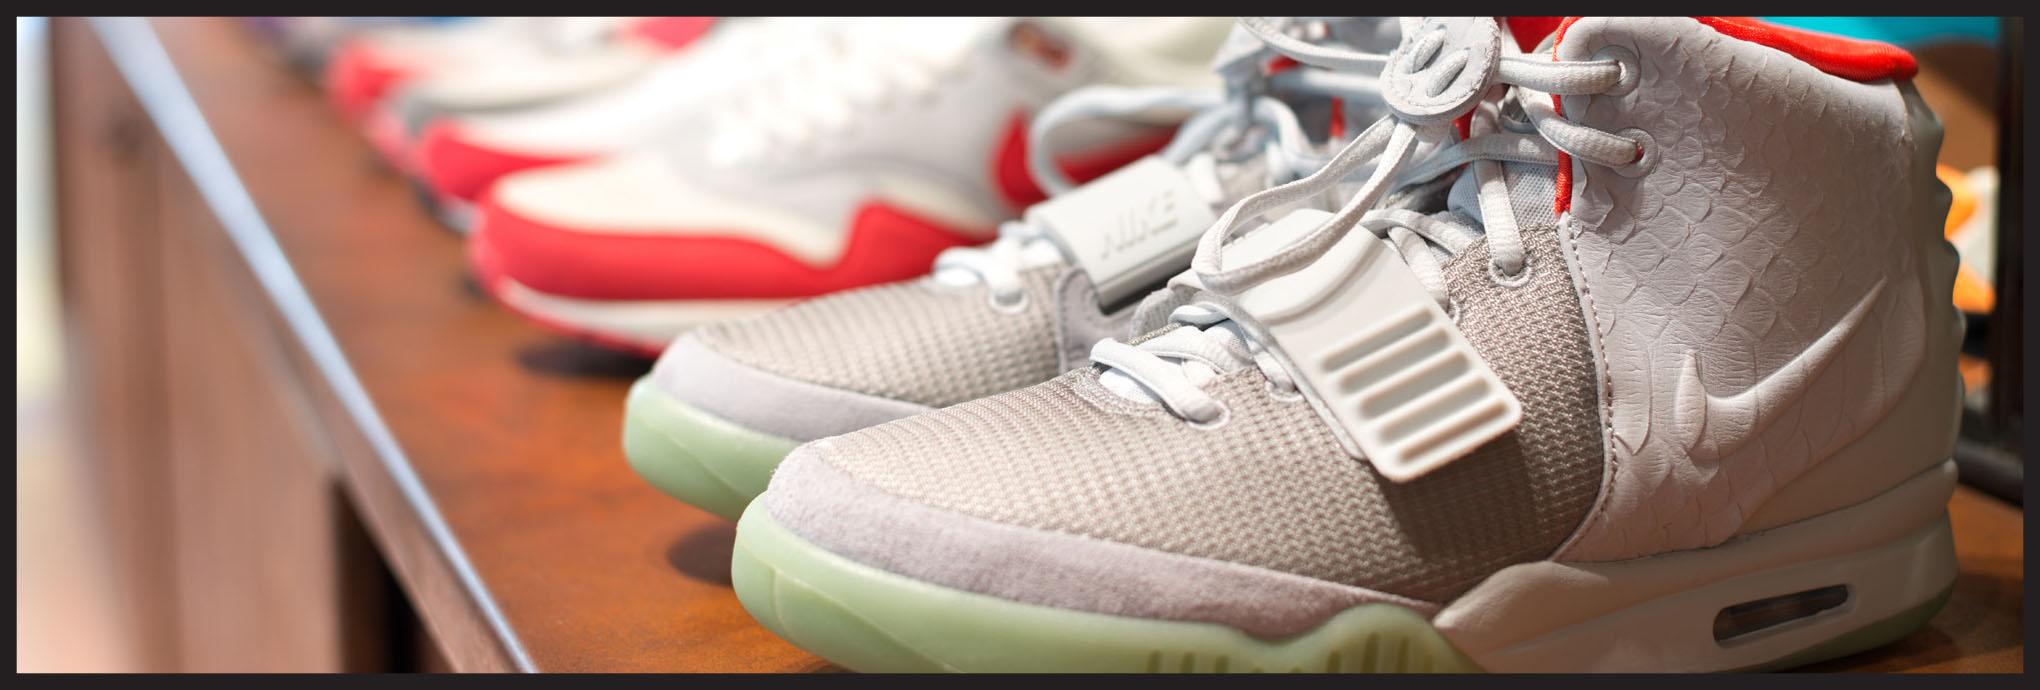 WMI_Sneaker_Header.jpg